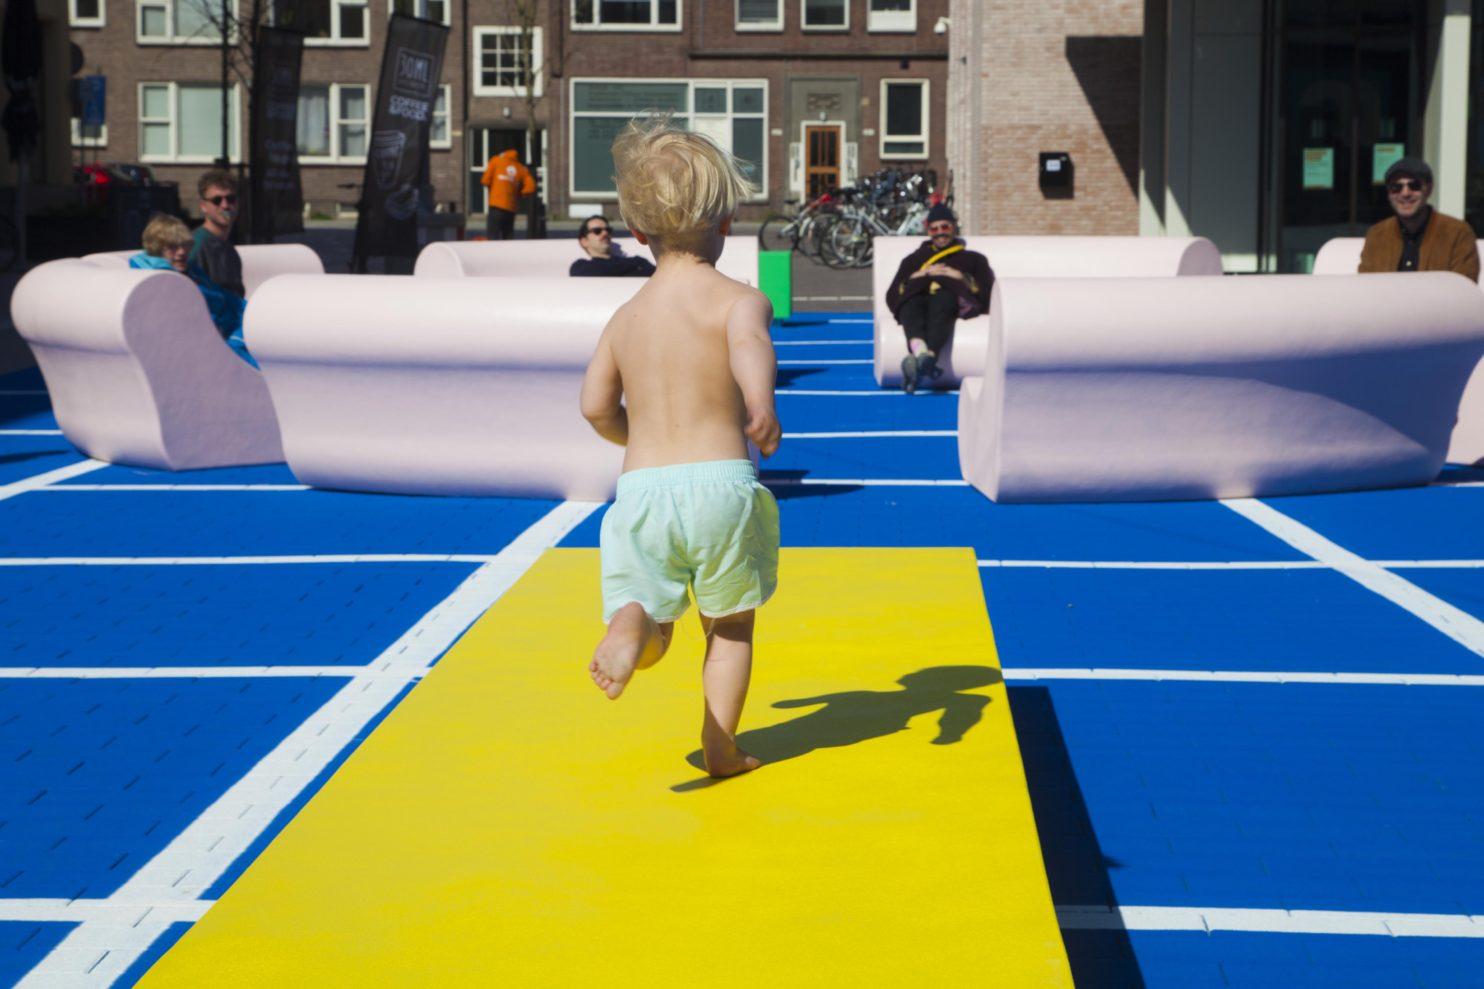 The Splash © Amber Leijen voor Arttenders x Cindy Bakker